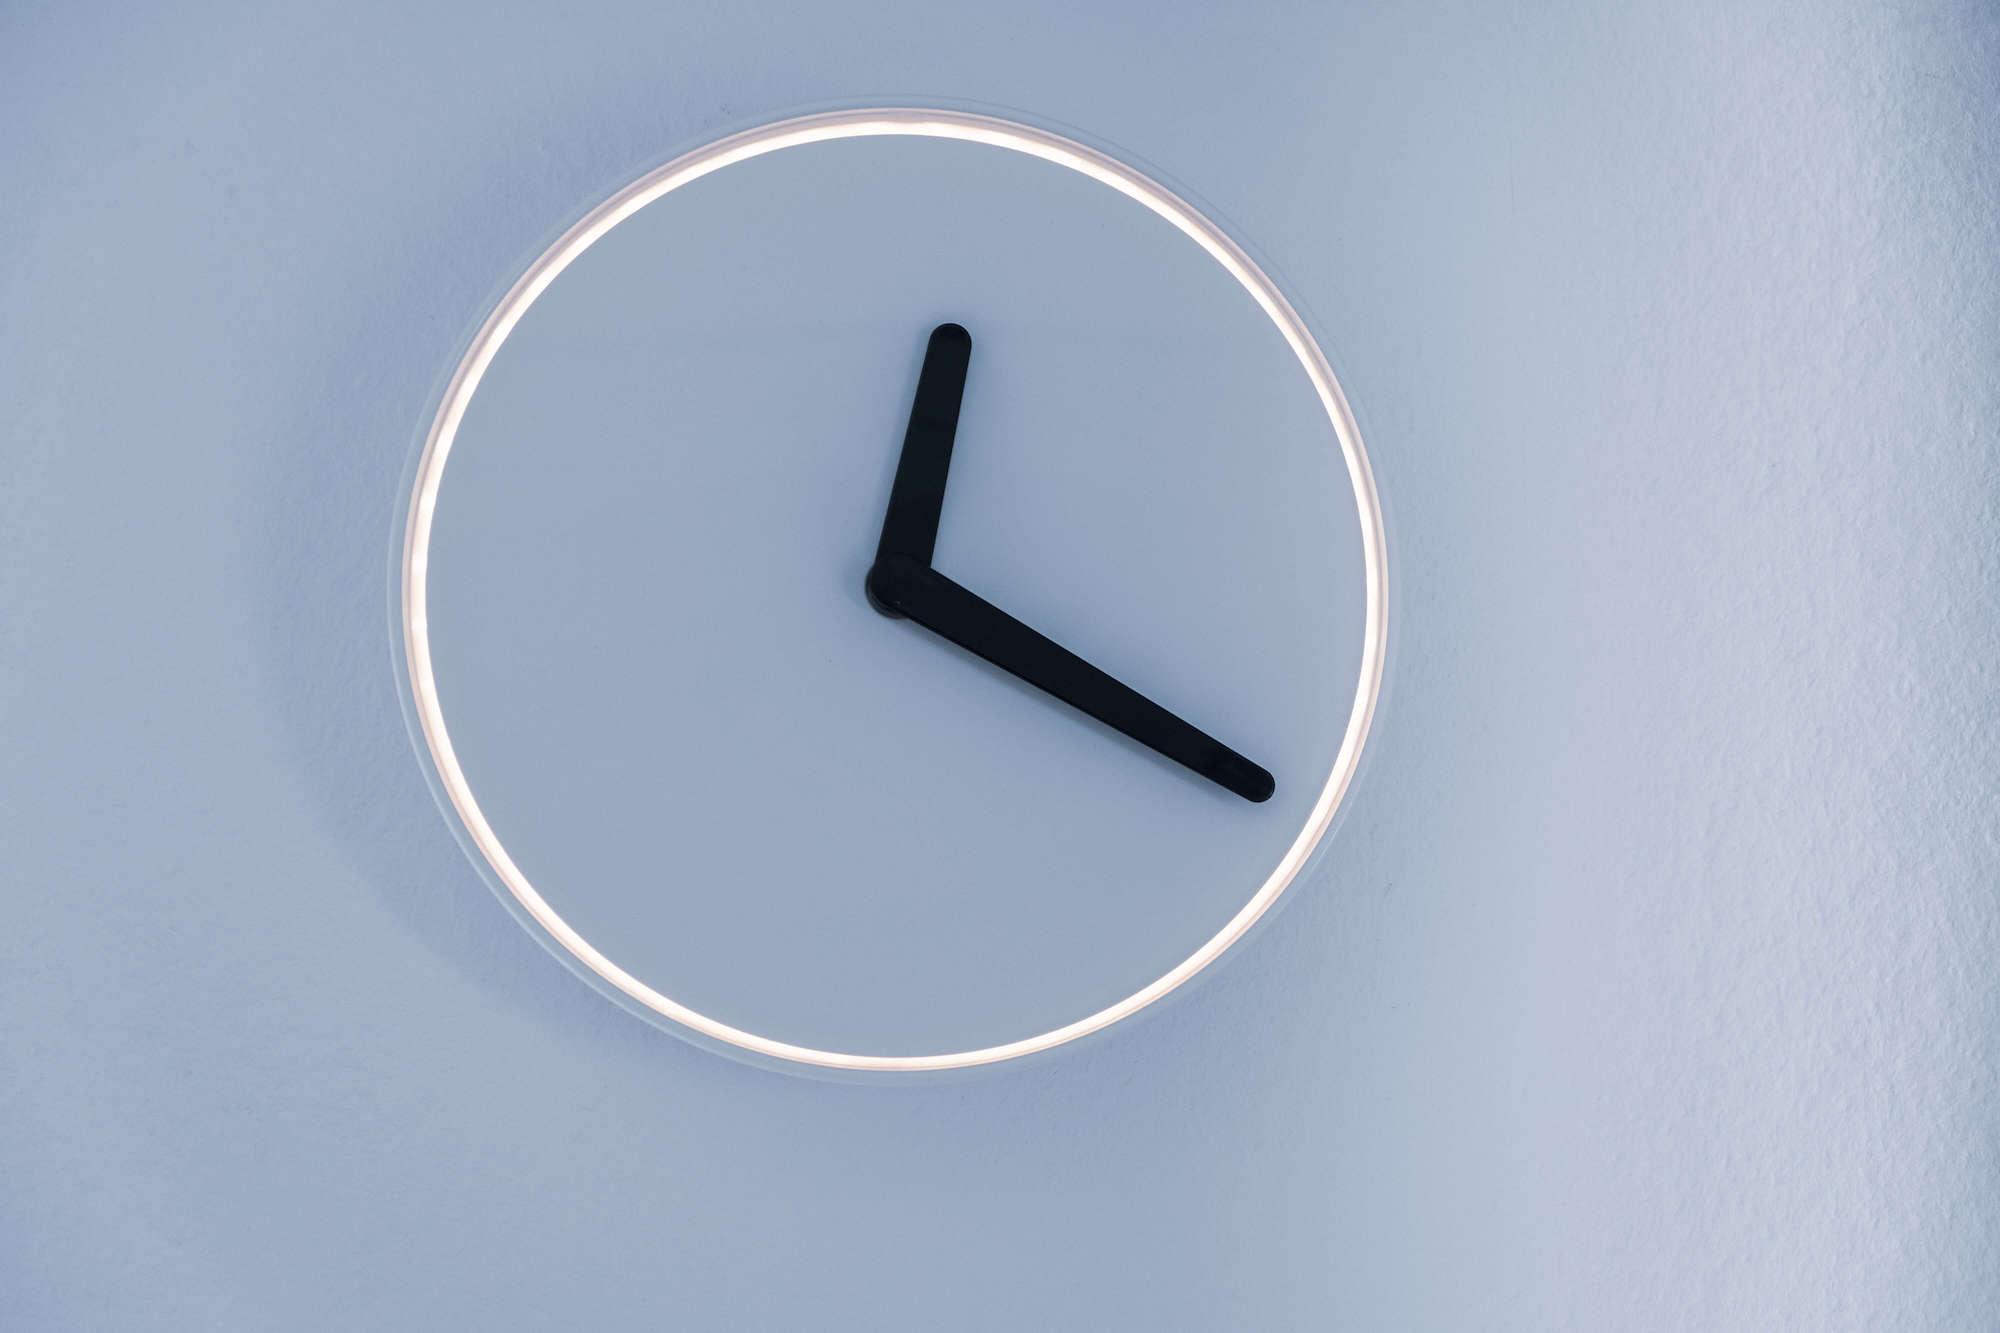 zegarek na niebieskim tle